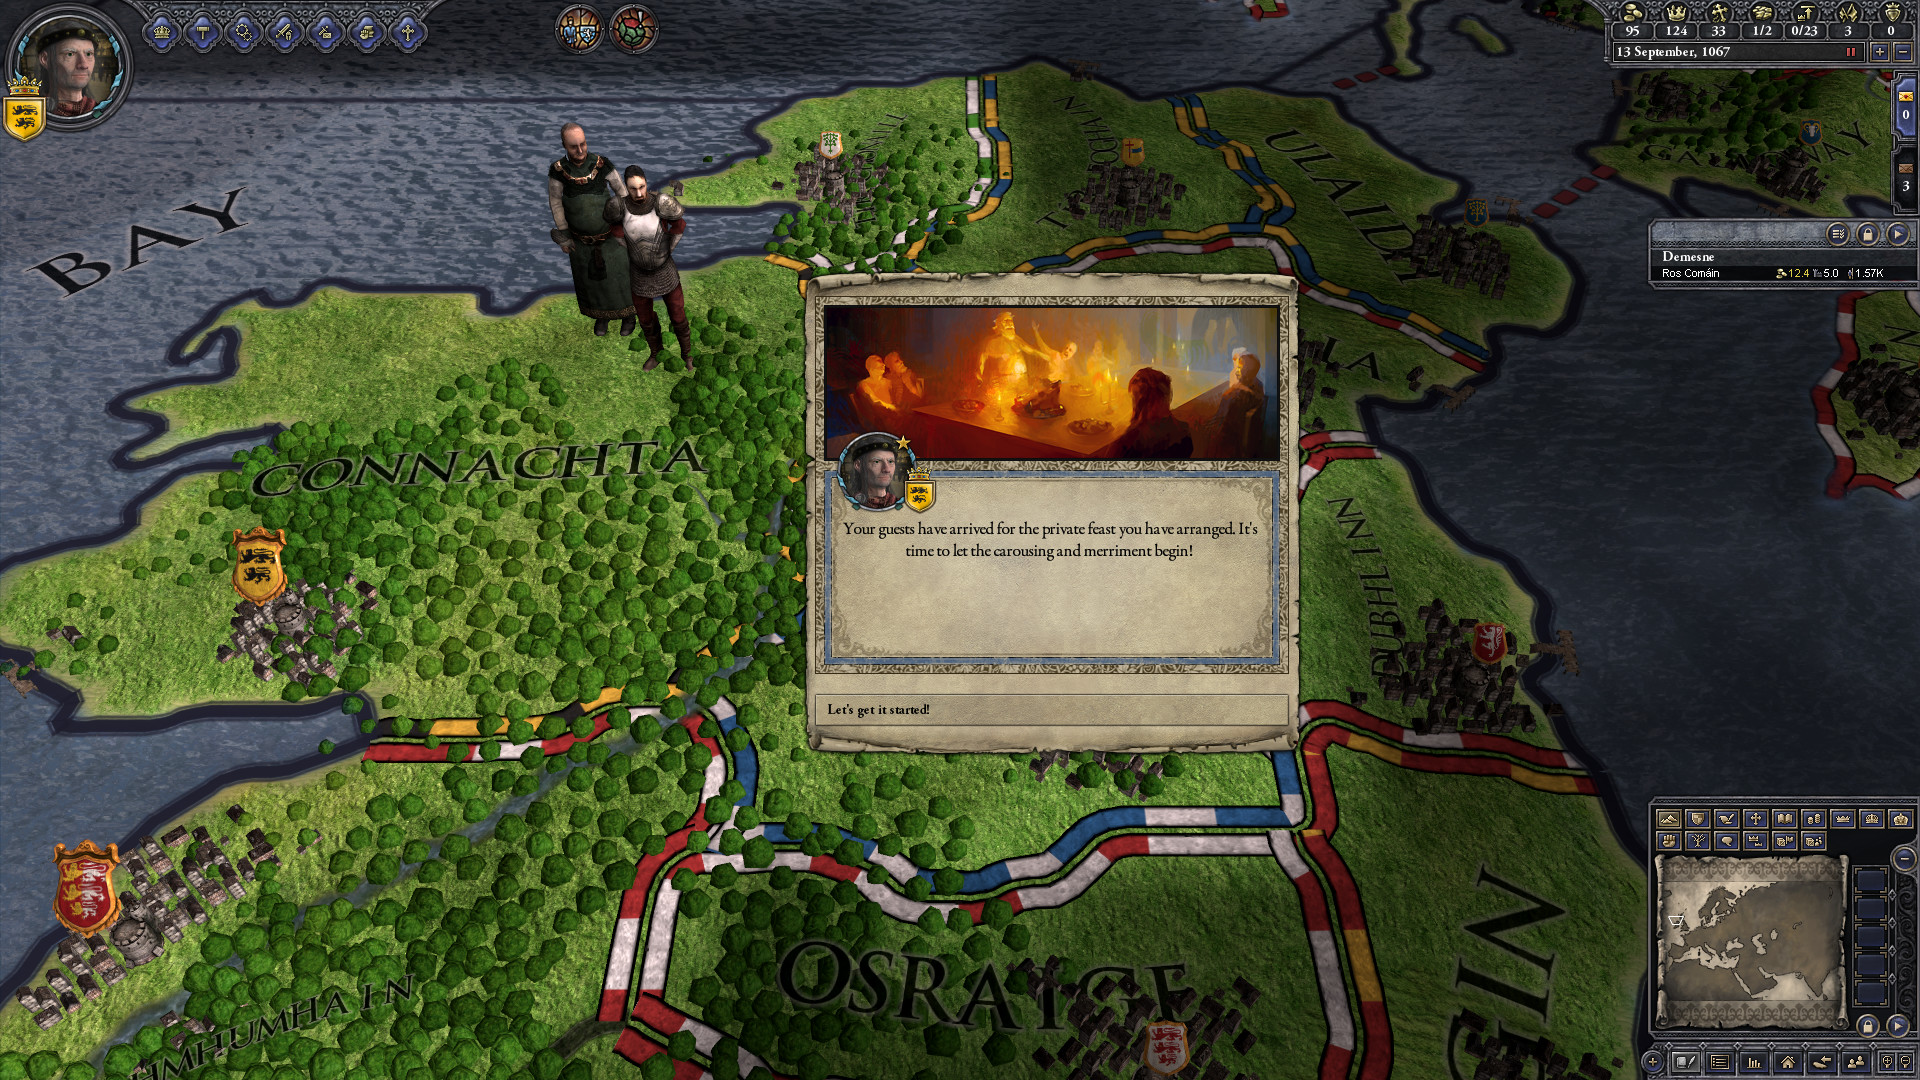 Expansion - Crusader Kings II: Way of Life screenshot